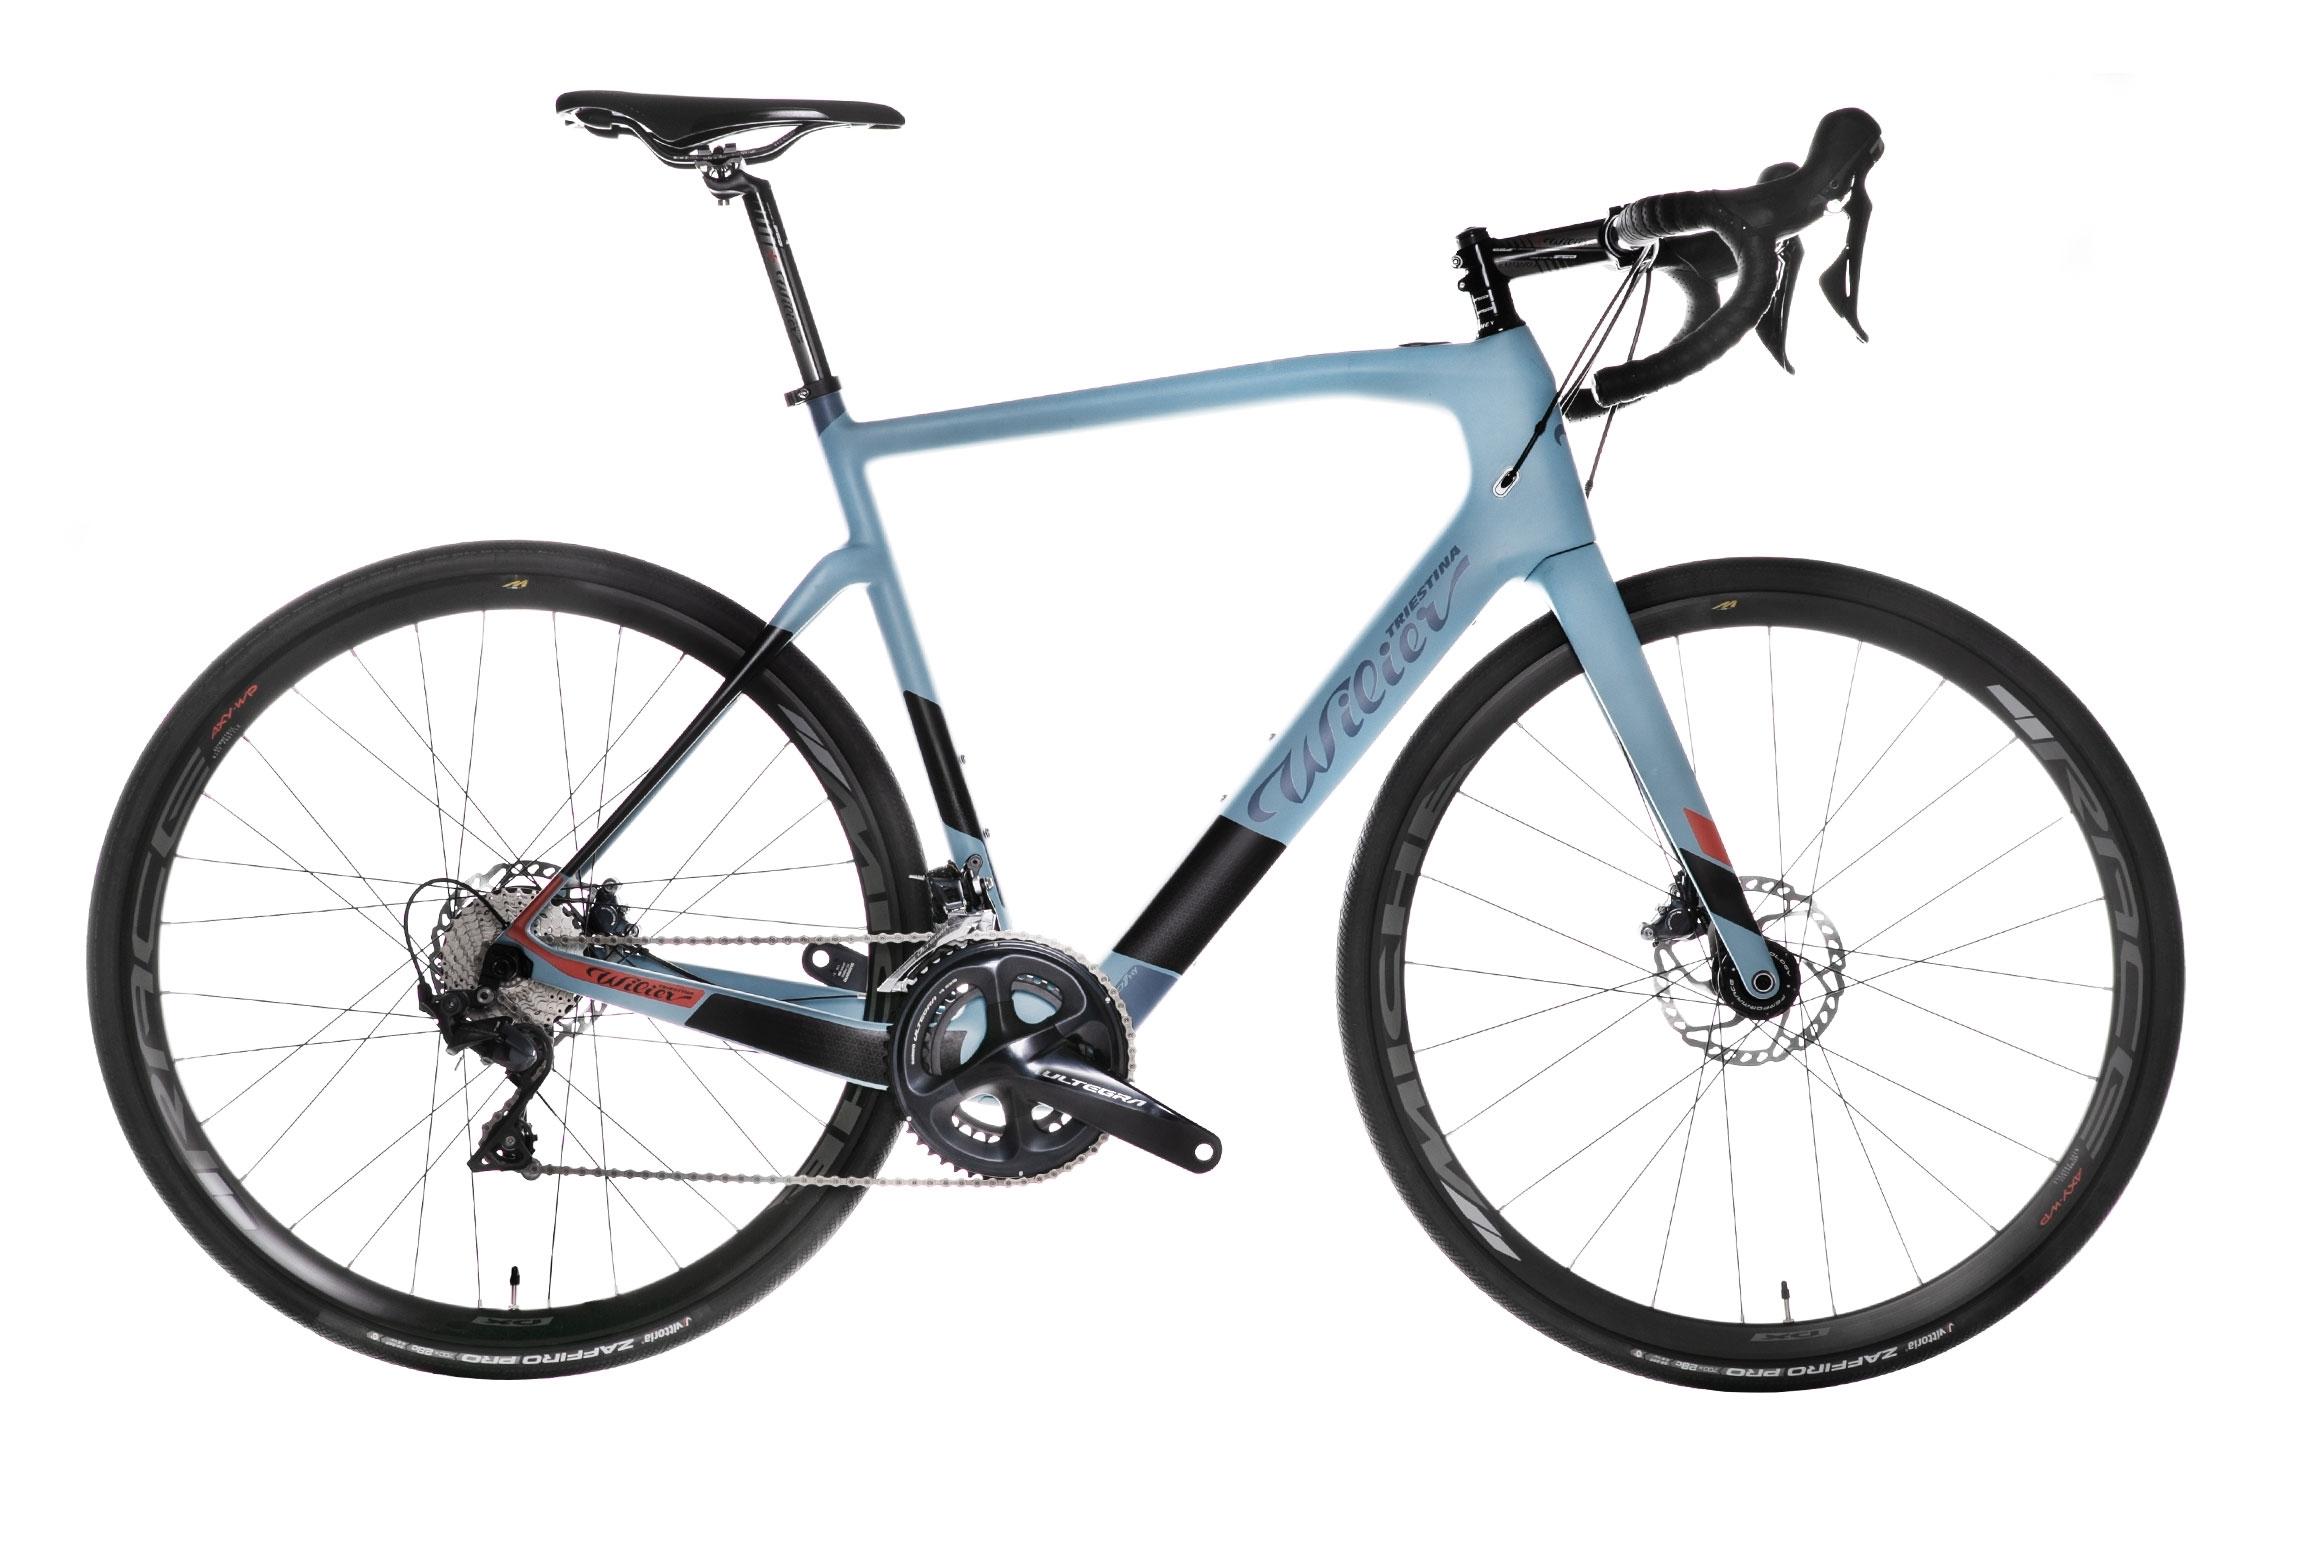 kolo CENTO1HY + ULTEGRA R8020 +MICHE blue black XL